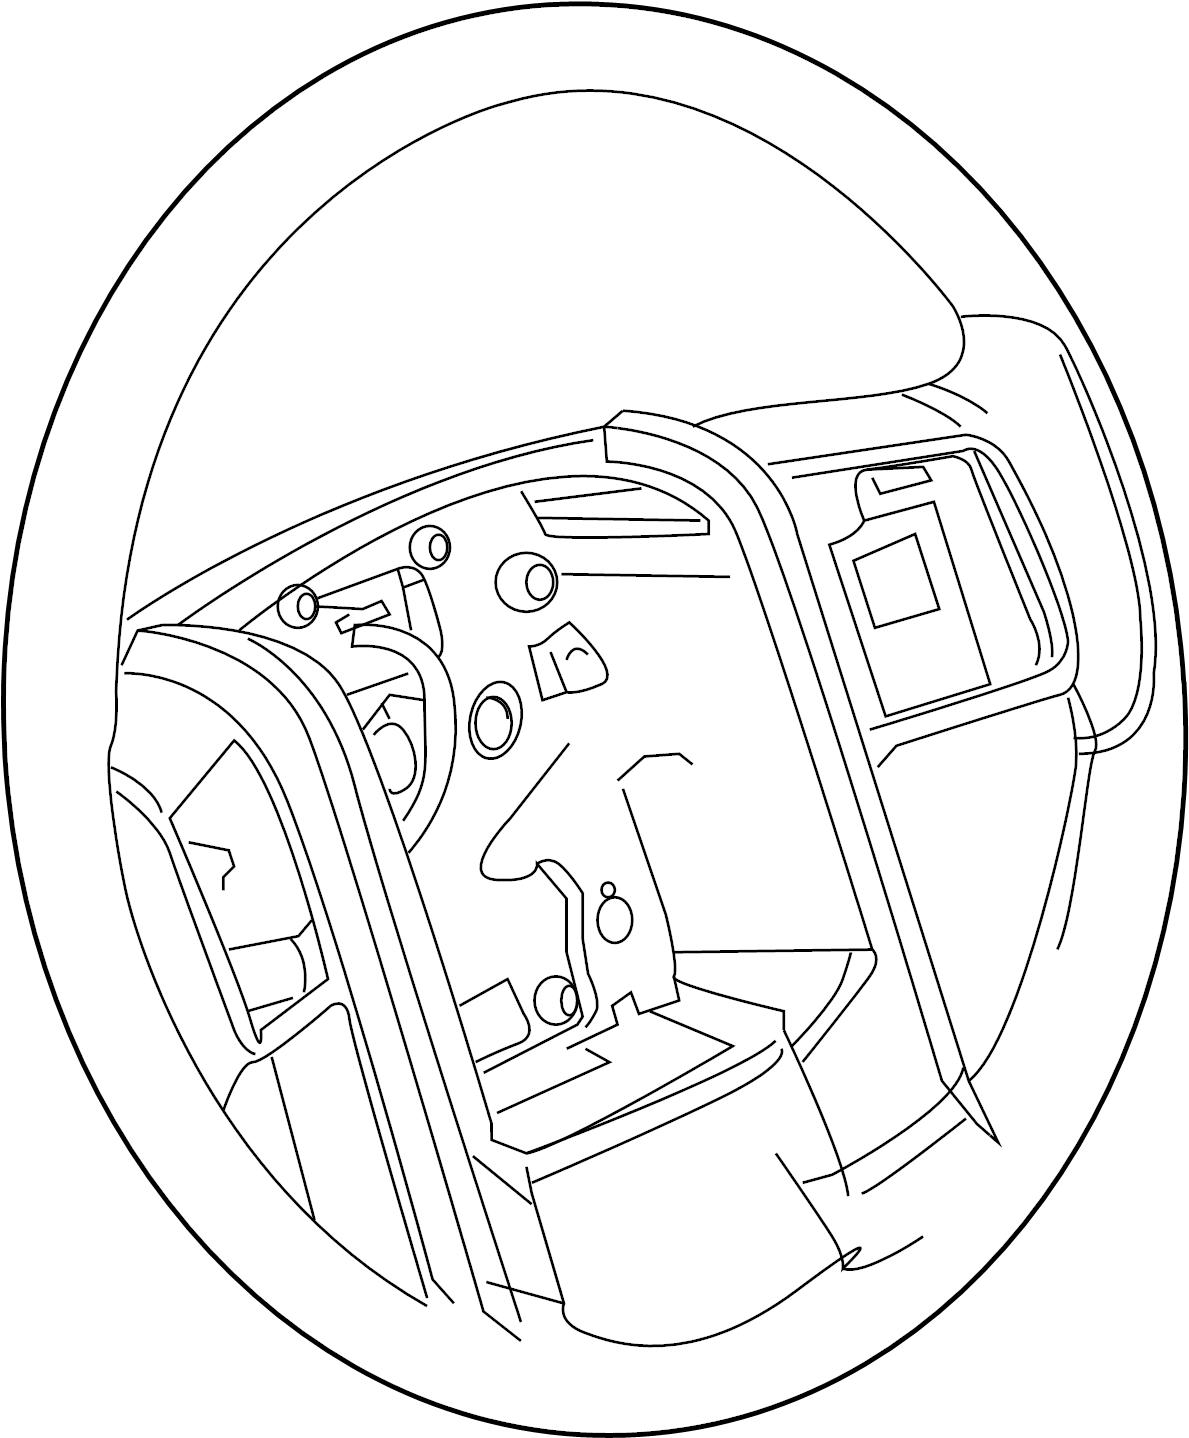 2008 ford f-250 super duty steering wheel